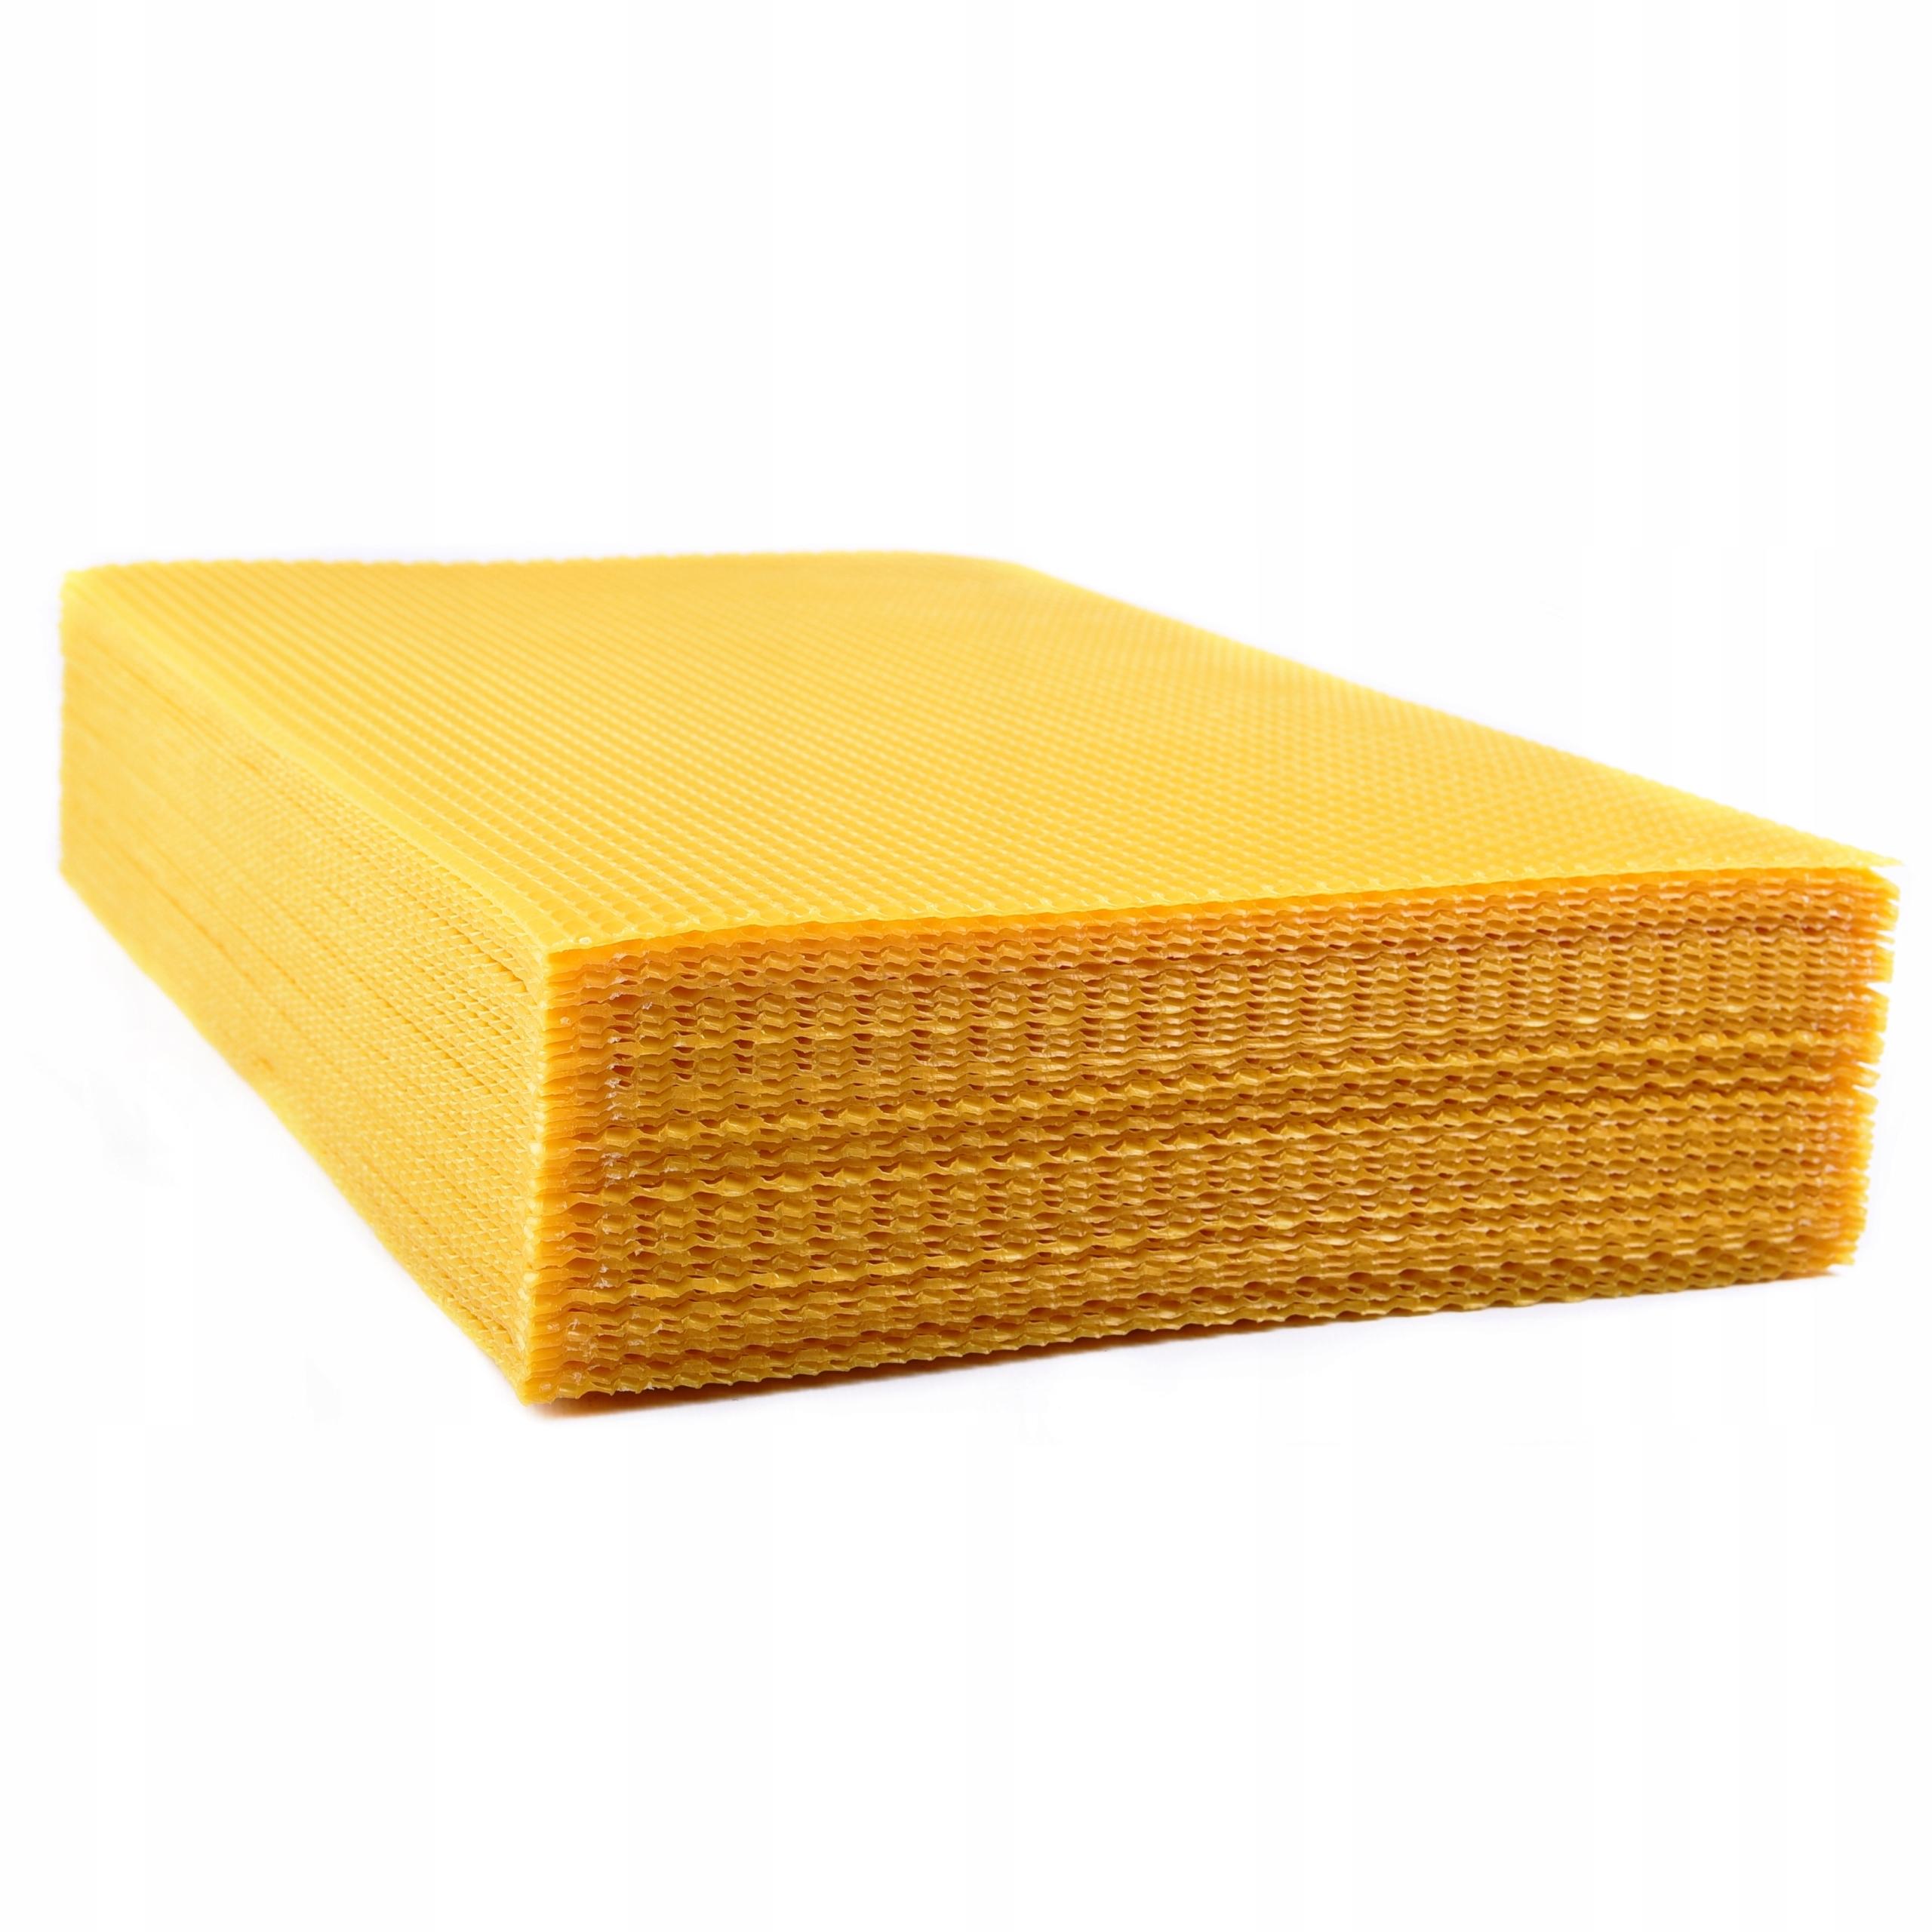 Пчелиный шланг WIELKOPOLSKA 5.4 5 кг